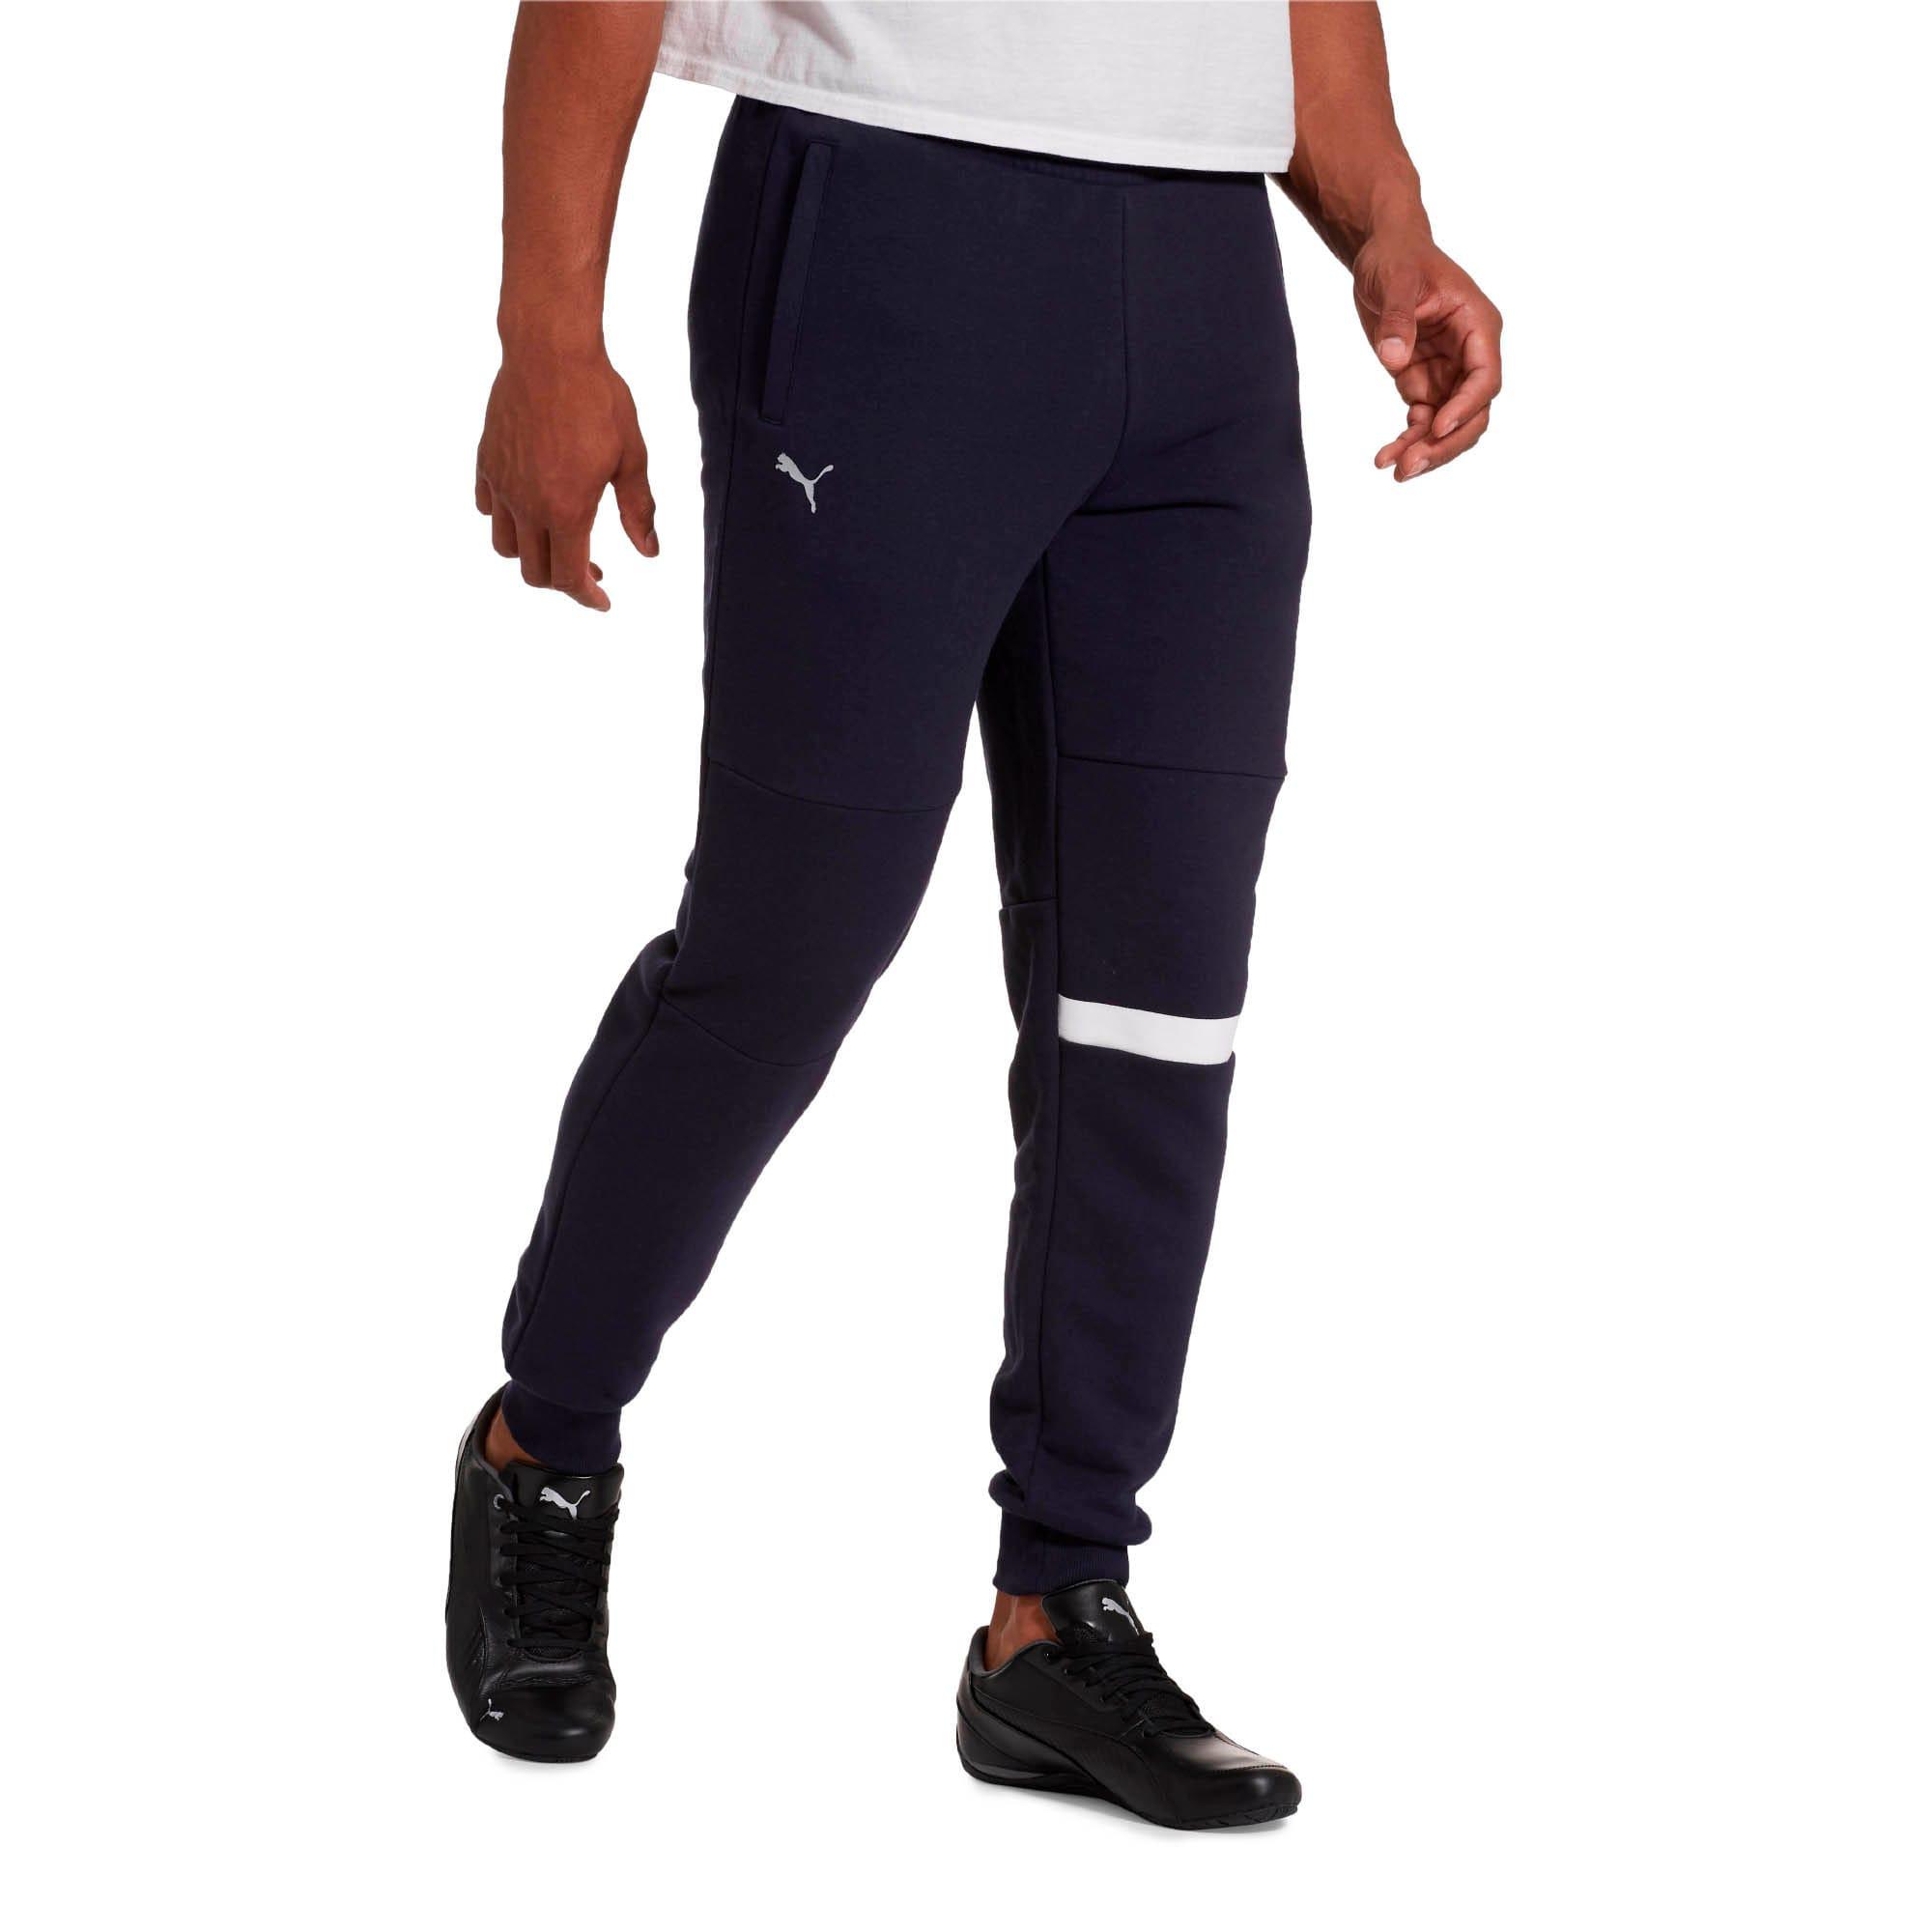 Miniatura 1 de Pantalones deportivos con logo Red Bull Racing para hombre, NIGHT SKY, mediano